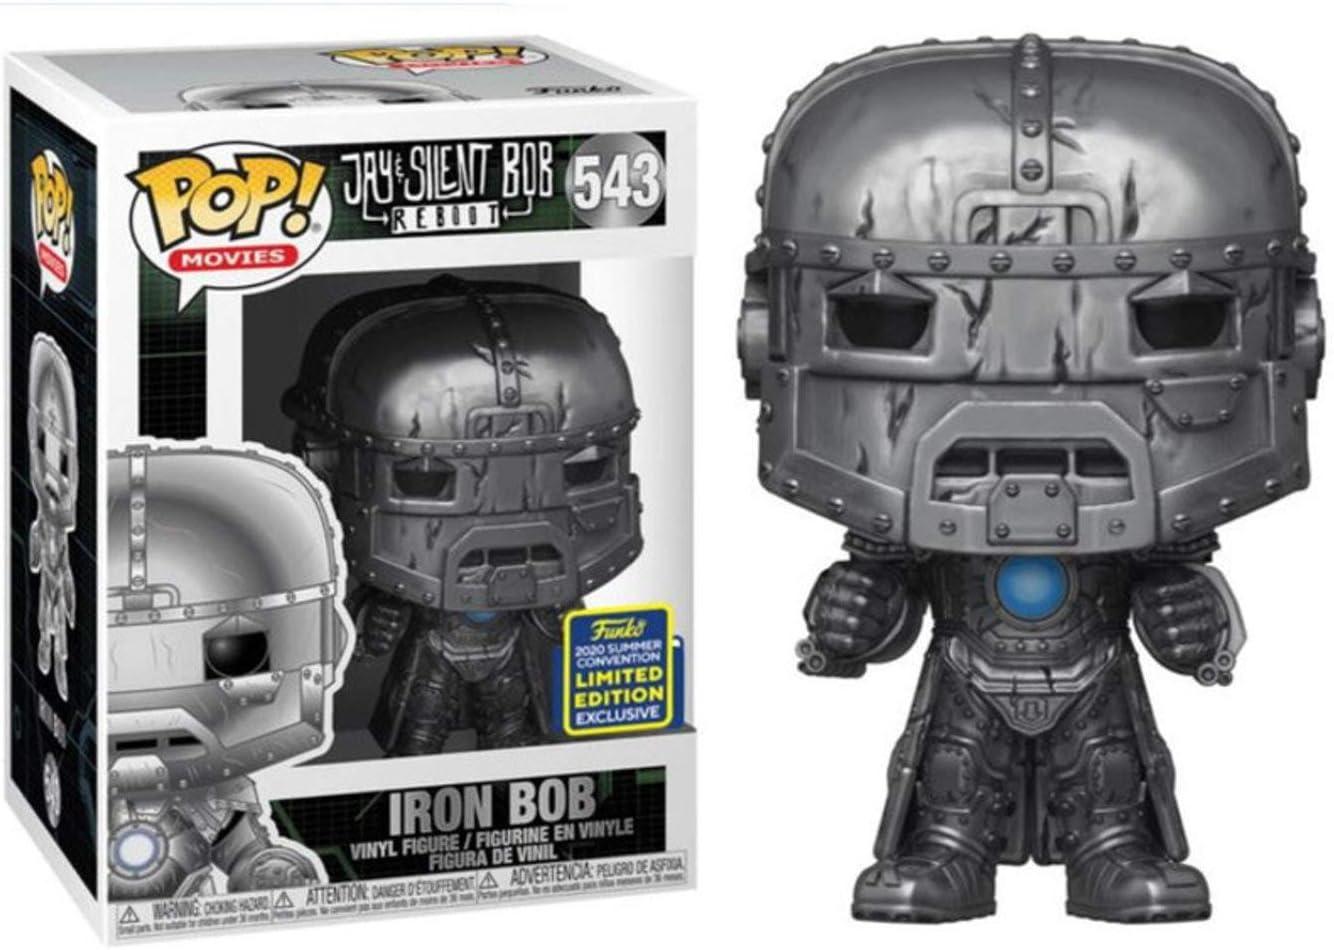 Jay /& Silent Bob Reboot Iron Bob SDCC 2020 Shared Exclusive Movies Funko Pop